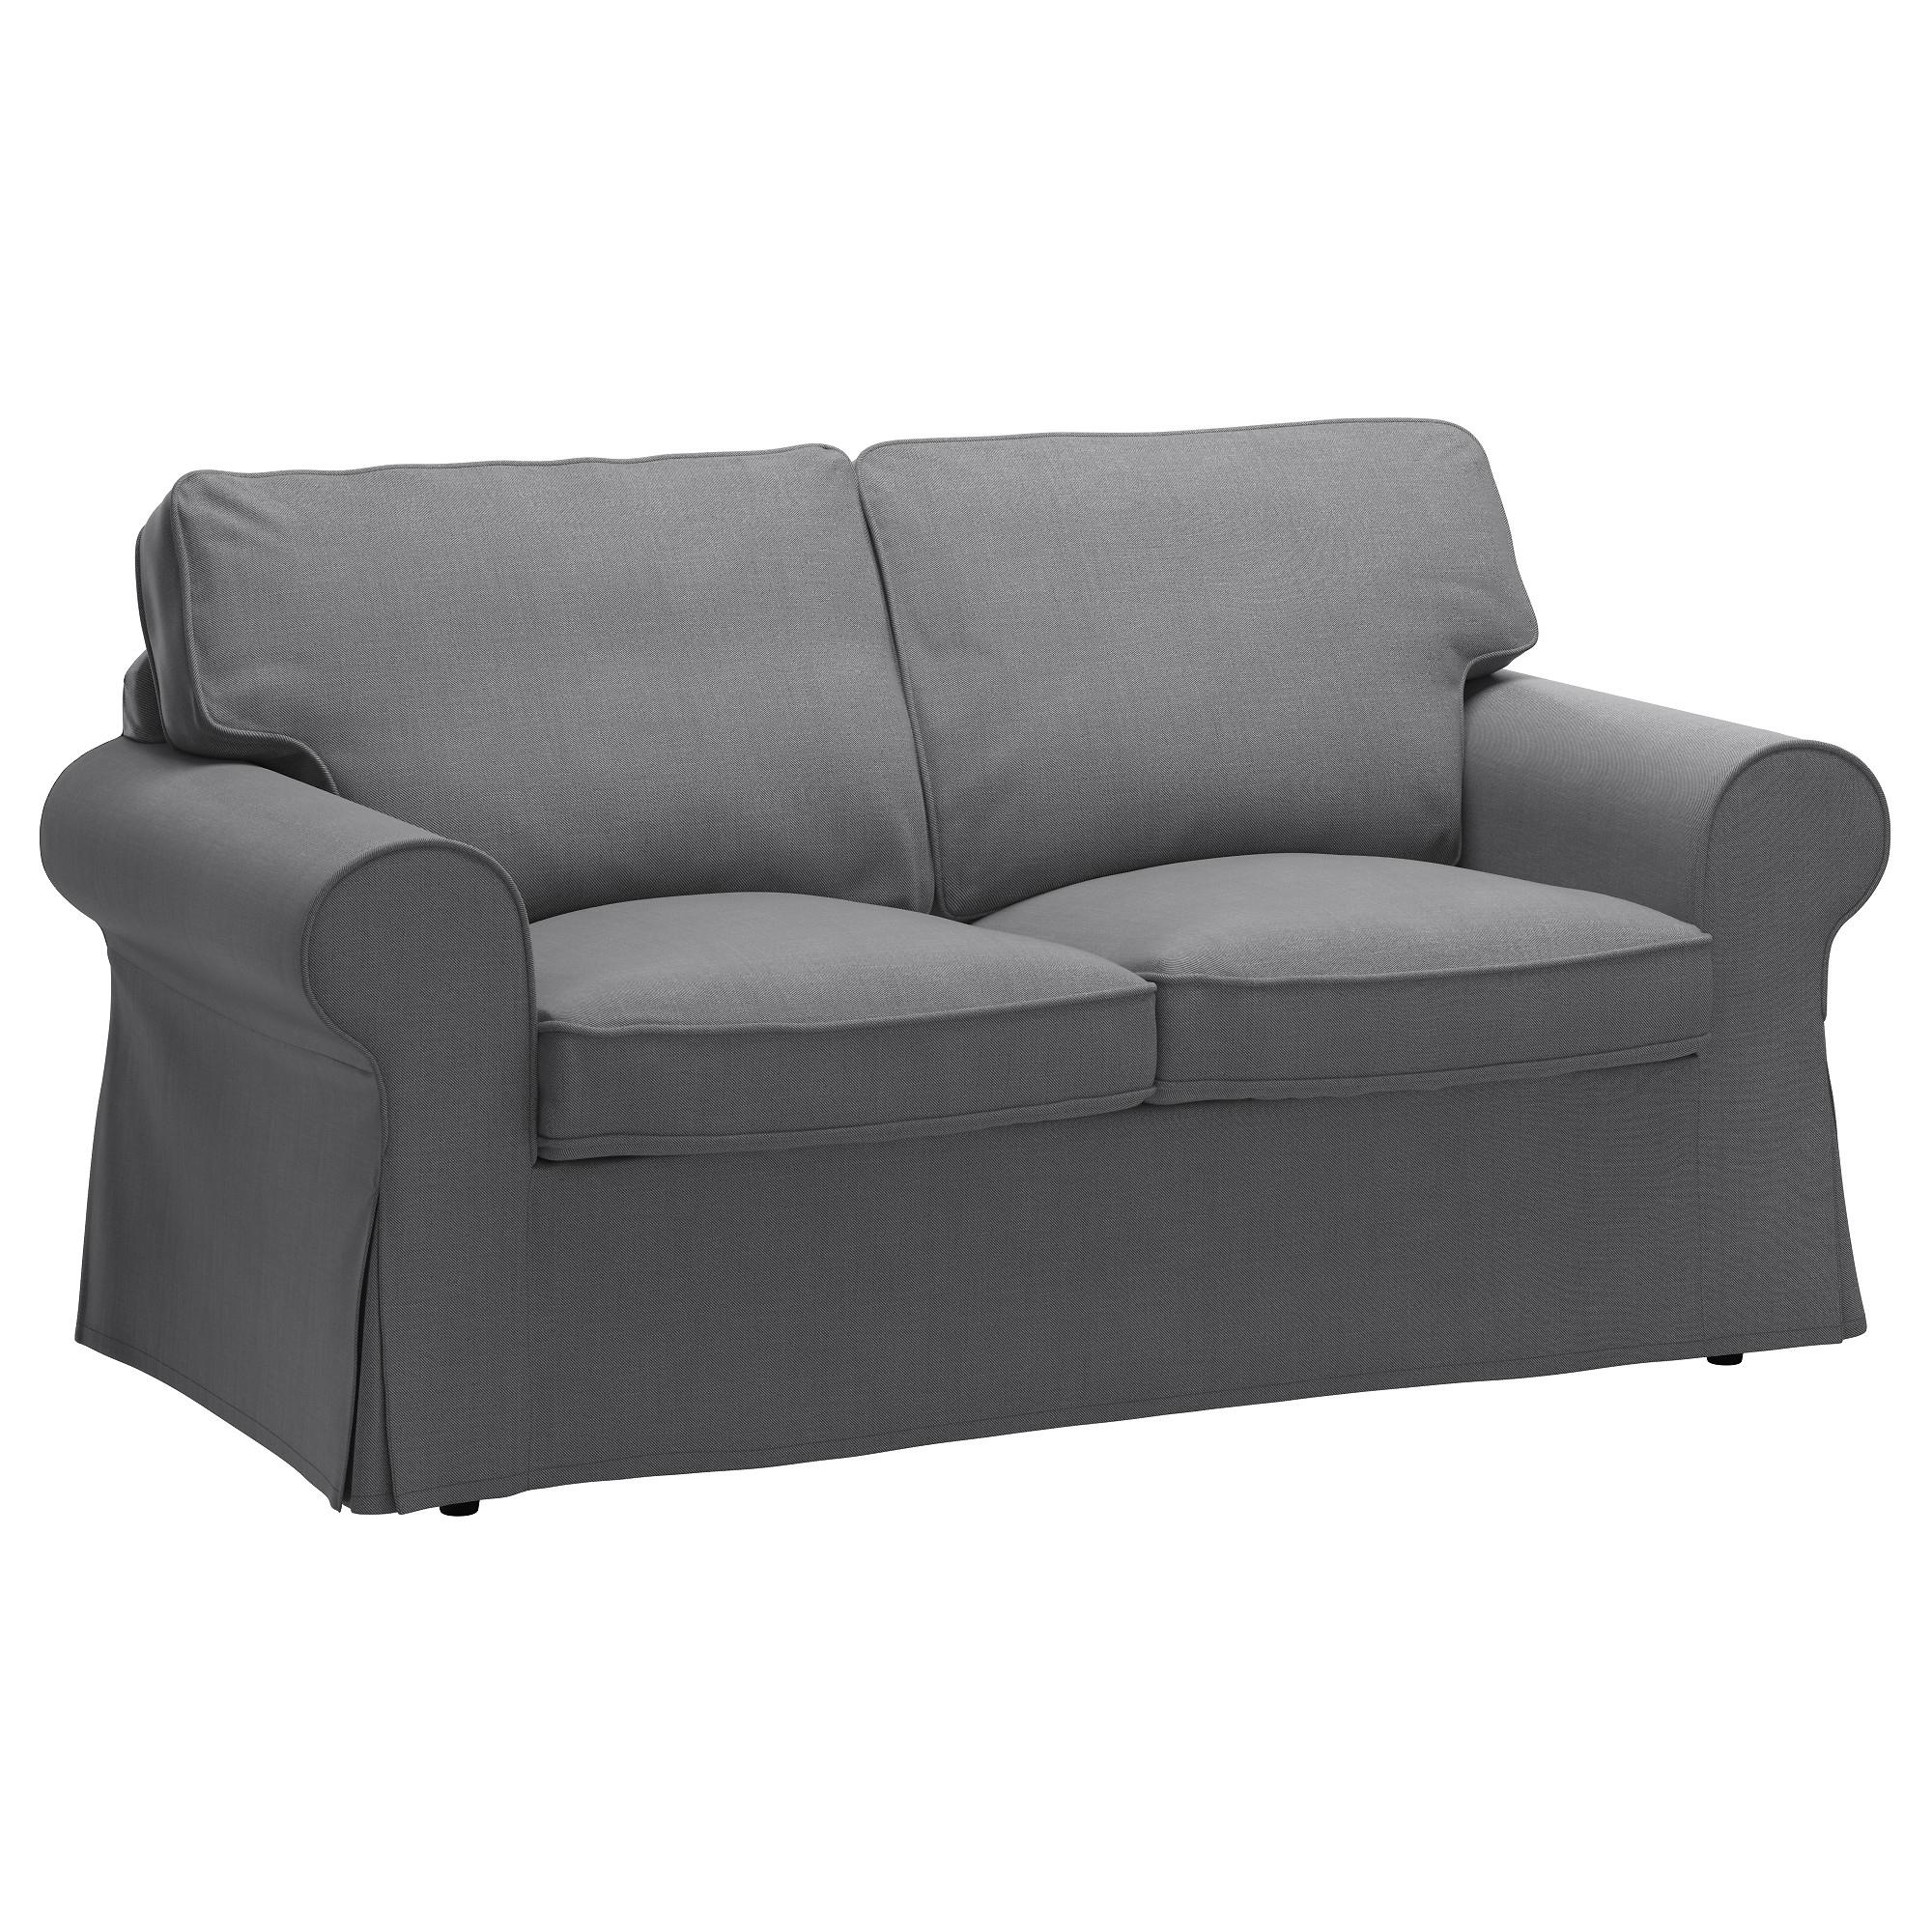 Widely Used Single Seat Sofa Chairs With Ektorp Two Seat Sofa Nordvalla Dark Grey – Ikea (View 5 of 15)